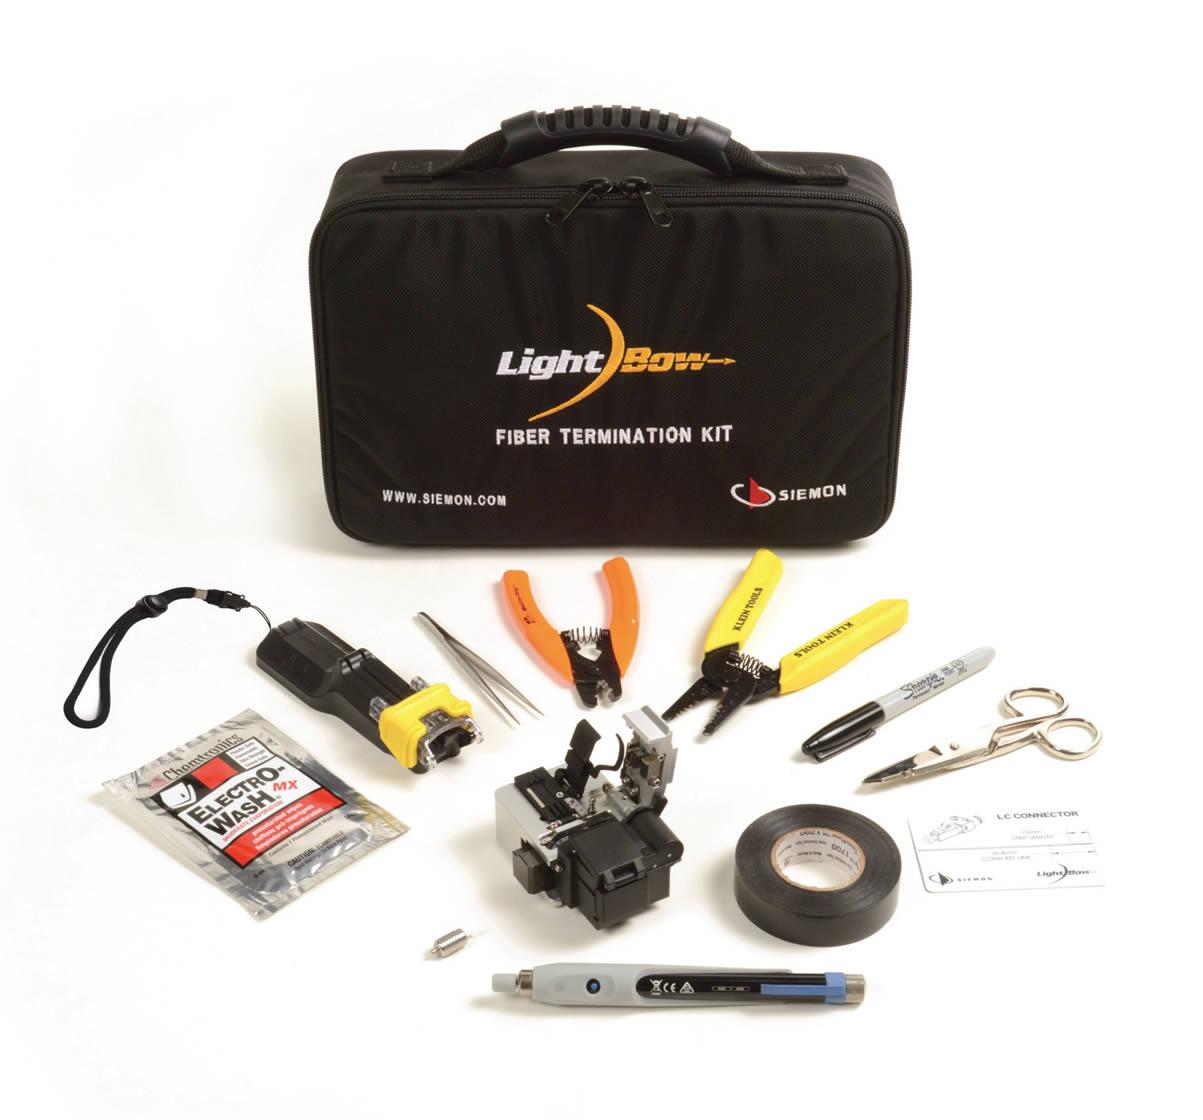 LightBow Fiber Termination Kit